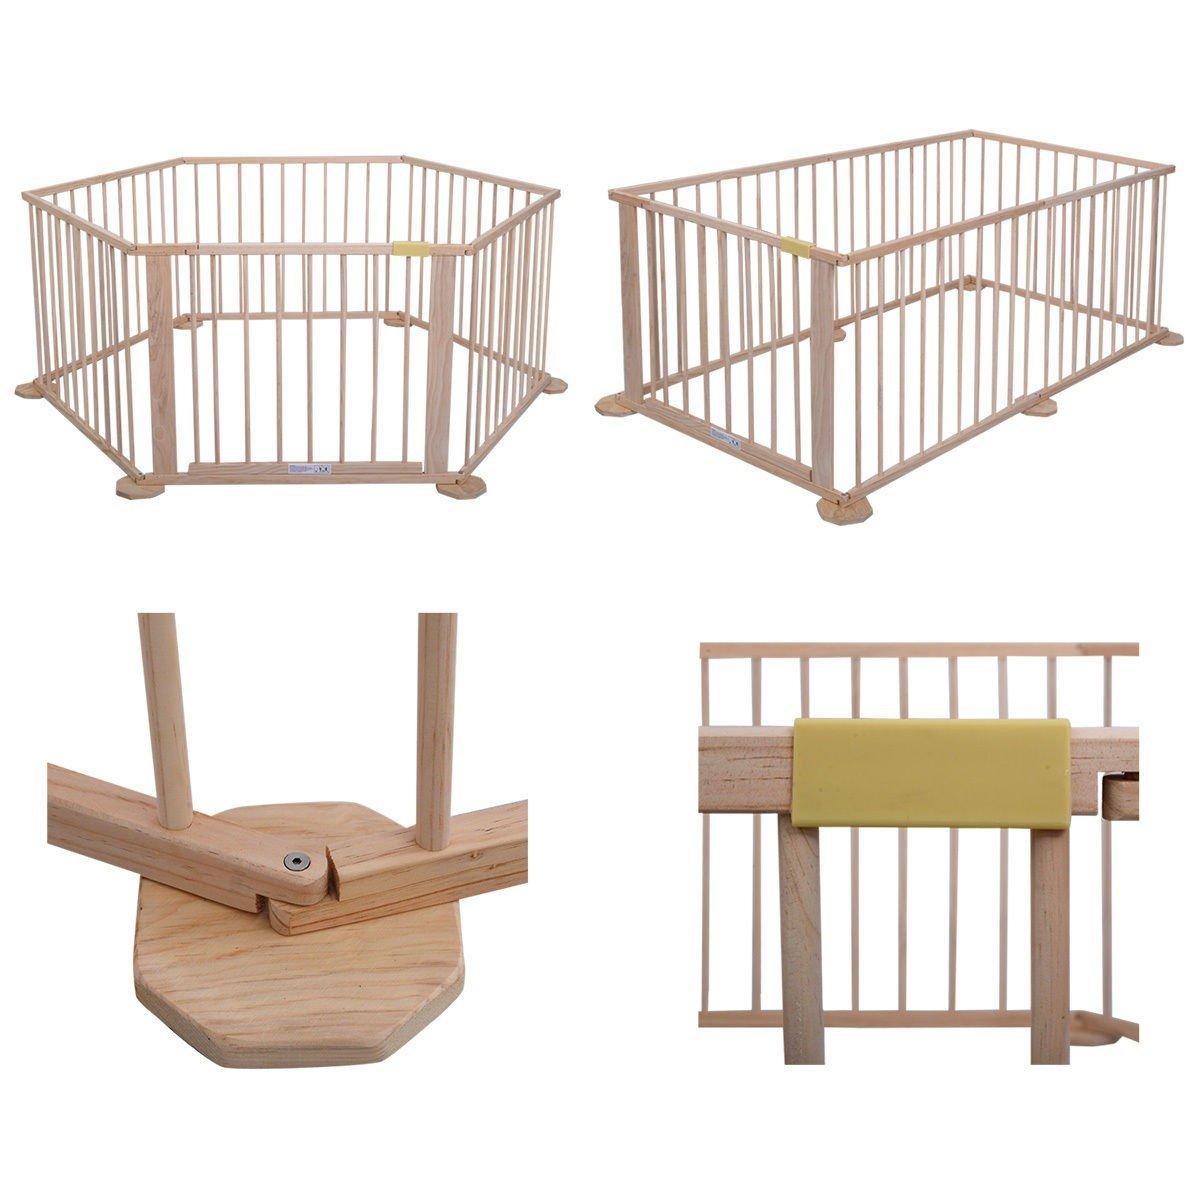 6 Panel Narural Wooden Safety Playpen Baby Children Indoor/Outdoor Divider